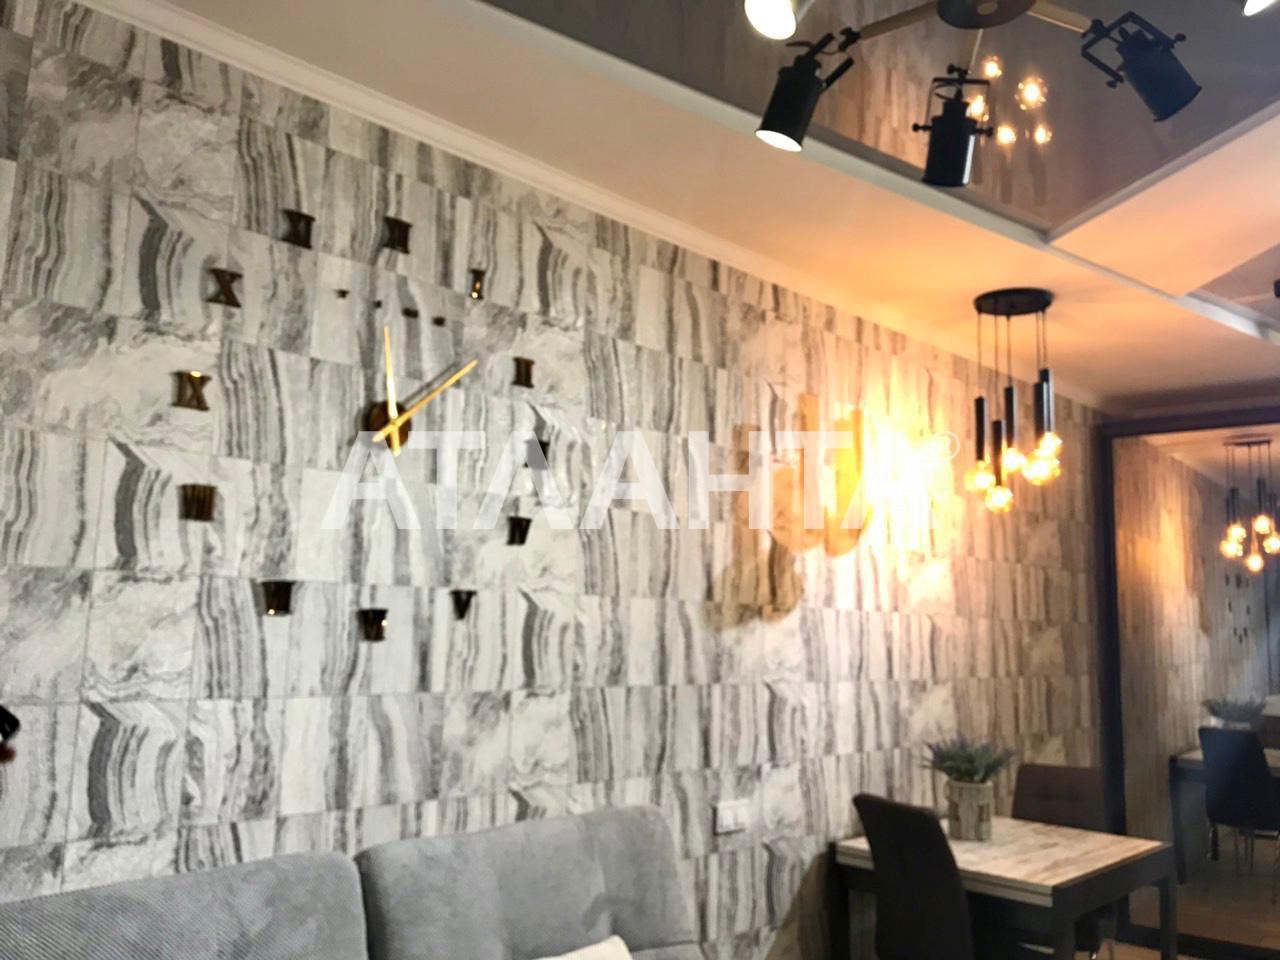 Продается 1-комнатная Квартира на ул. Генуэзская — 68 000 у.е. (фото №5)